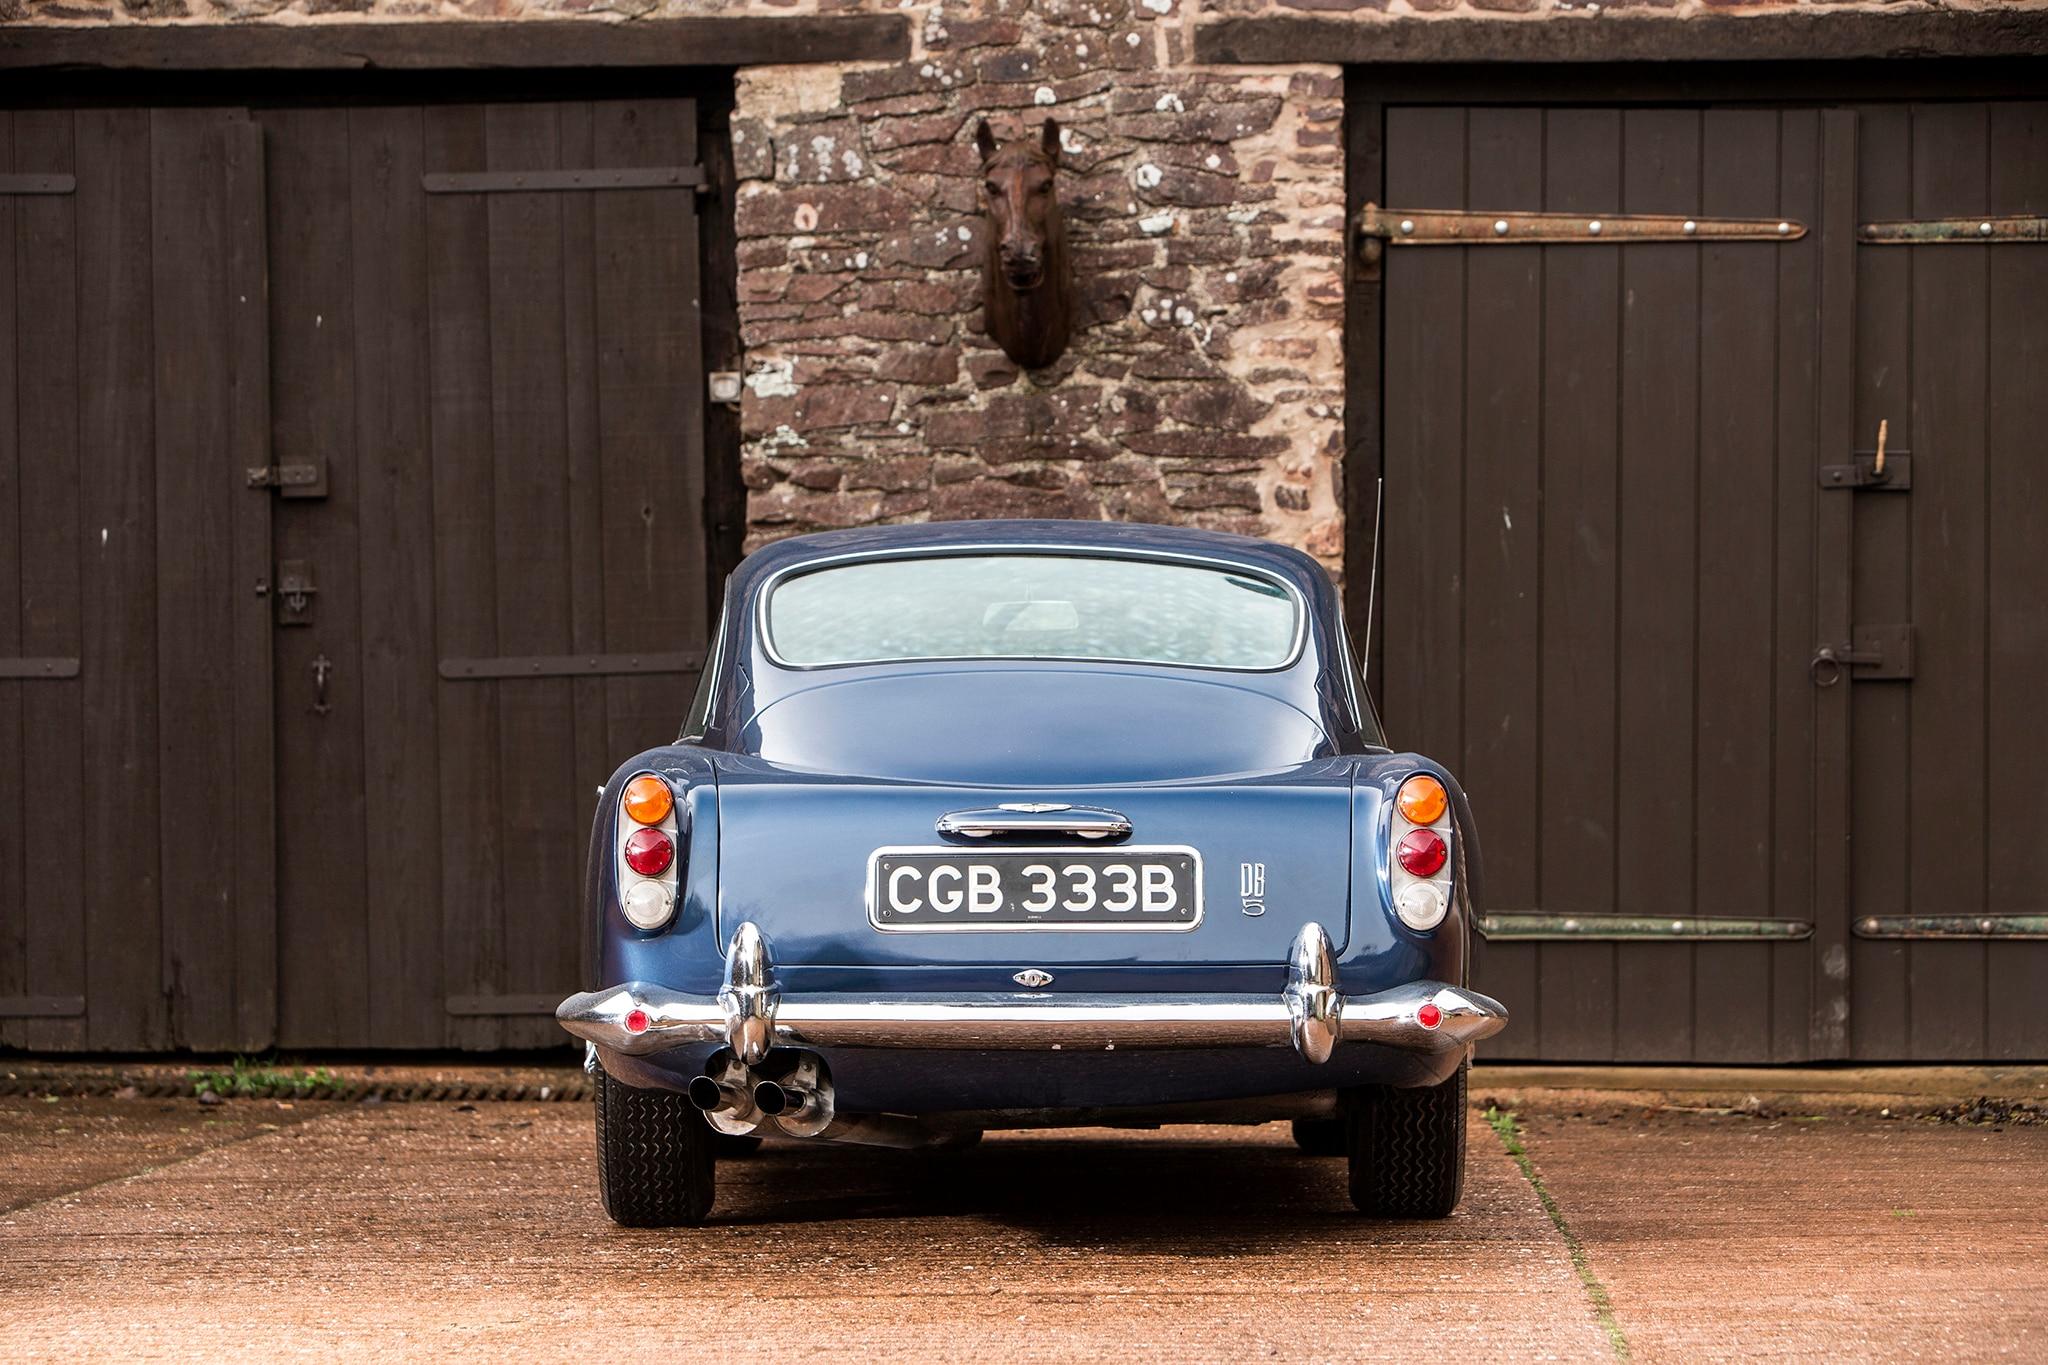 1964 Aston Martin DB5 Bonhams Rear